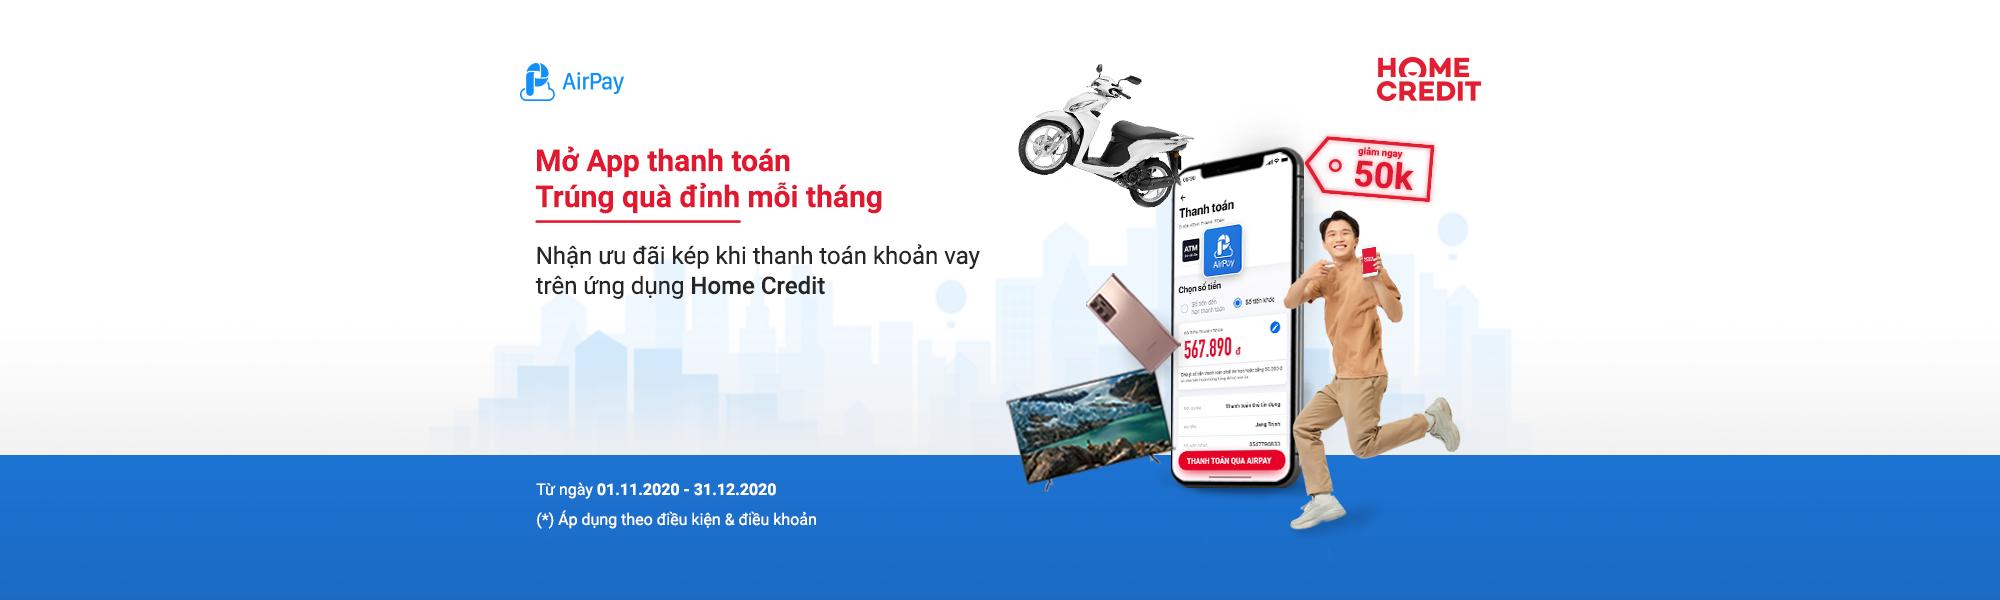 airpay-homecredit